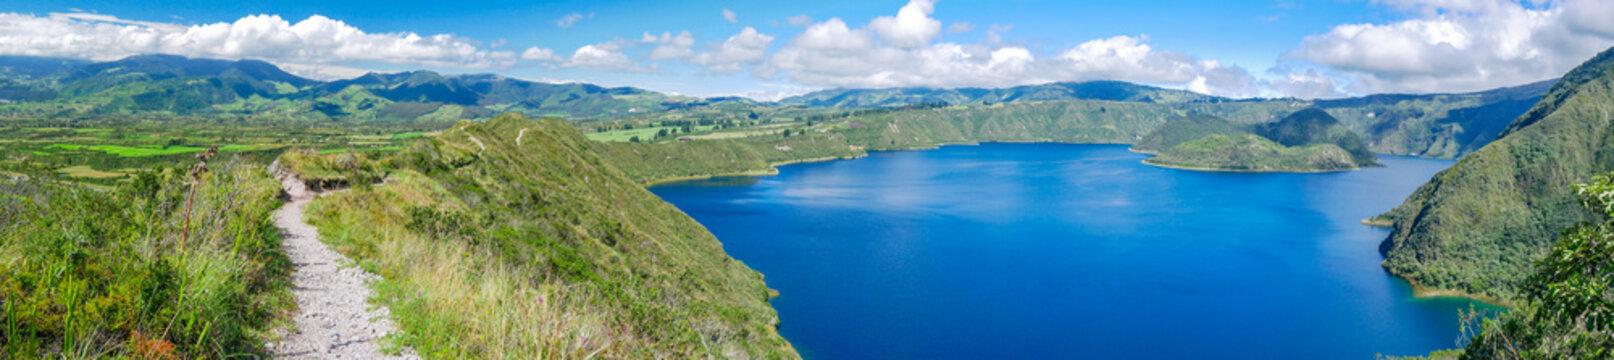 Laguna Cuicocha (Cotacachi) in Ecuador, South America